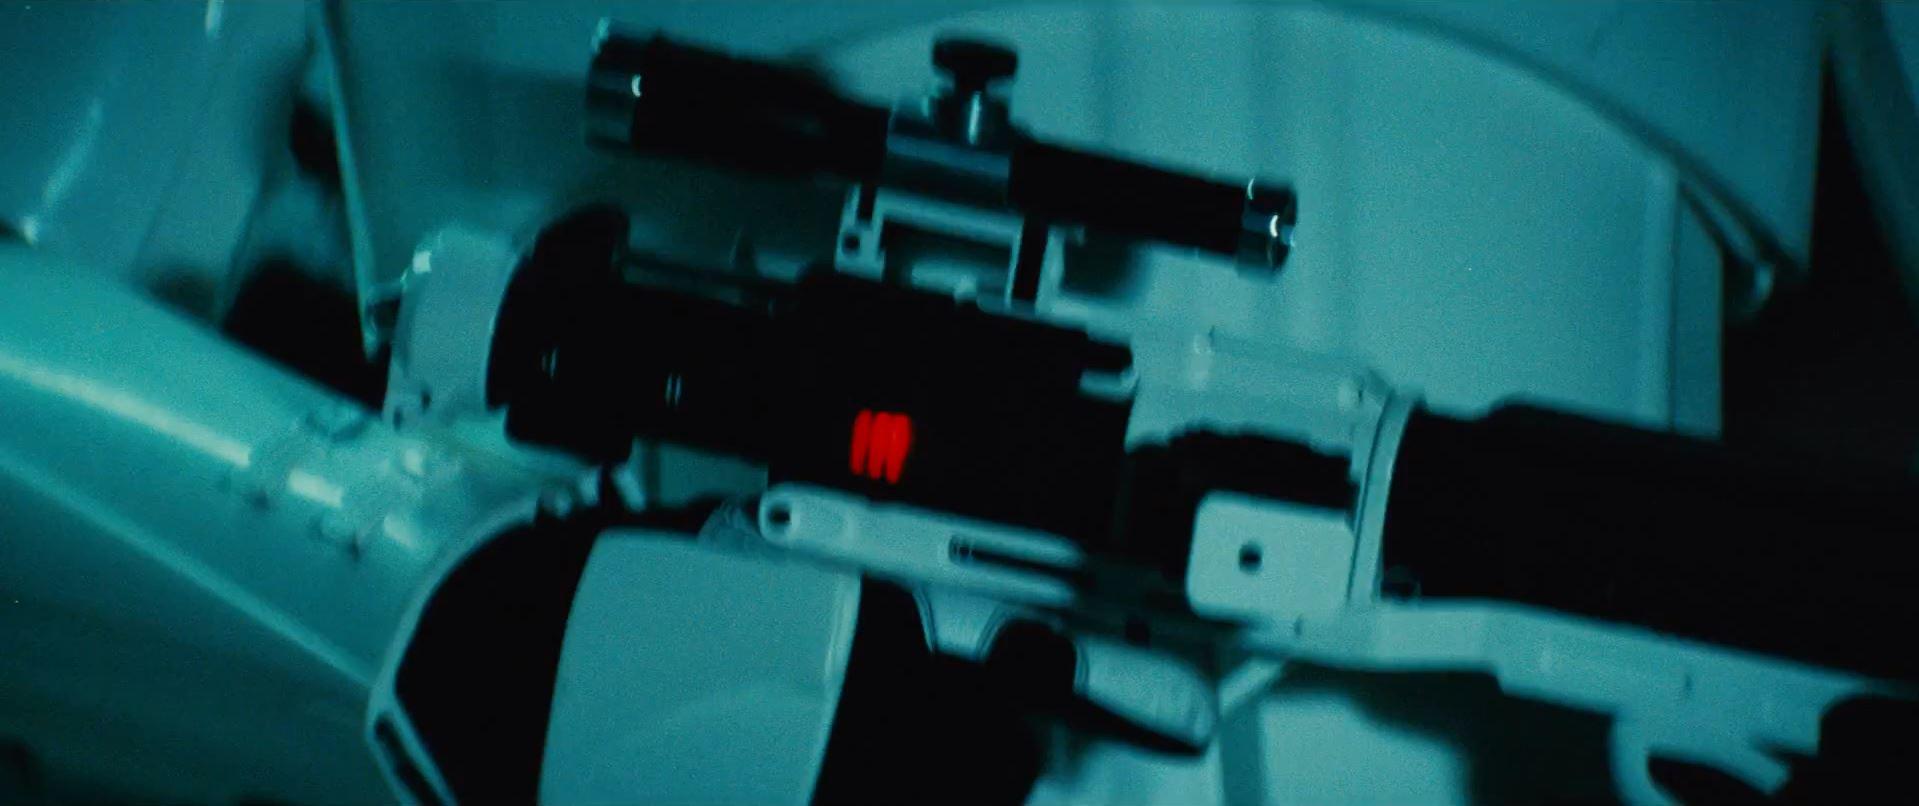 new storm trooper blaster rifles - Star Wars Episode 7 trailer released